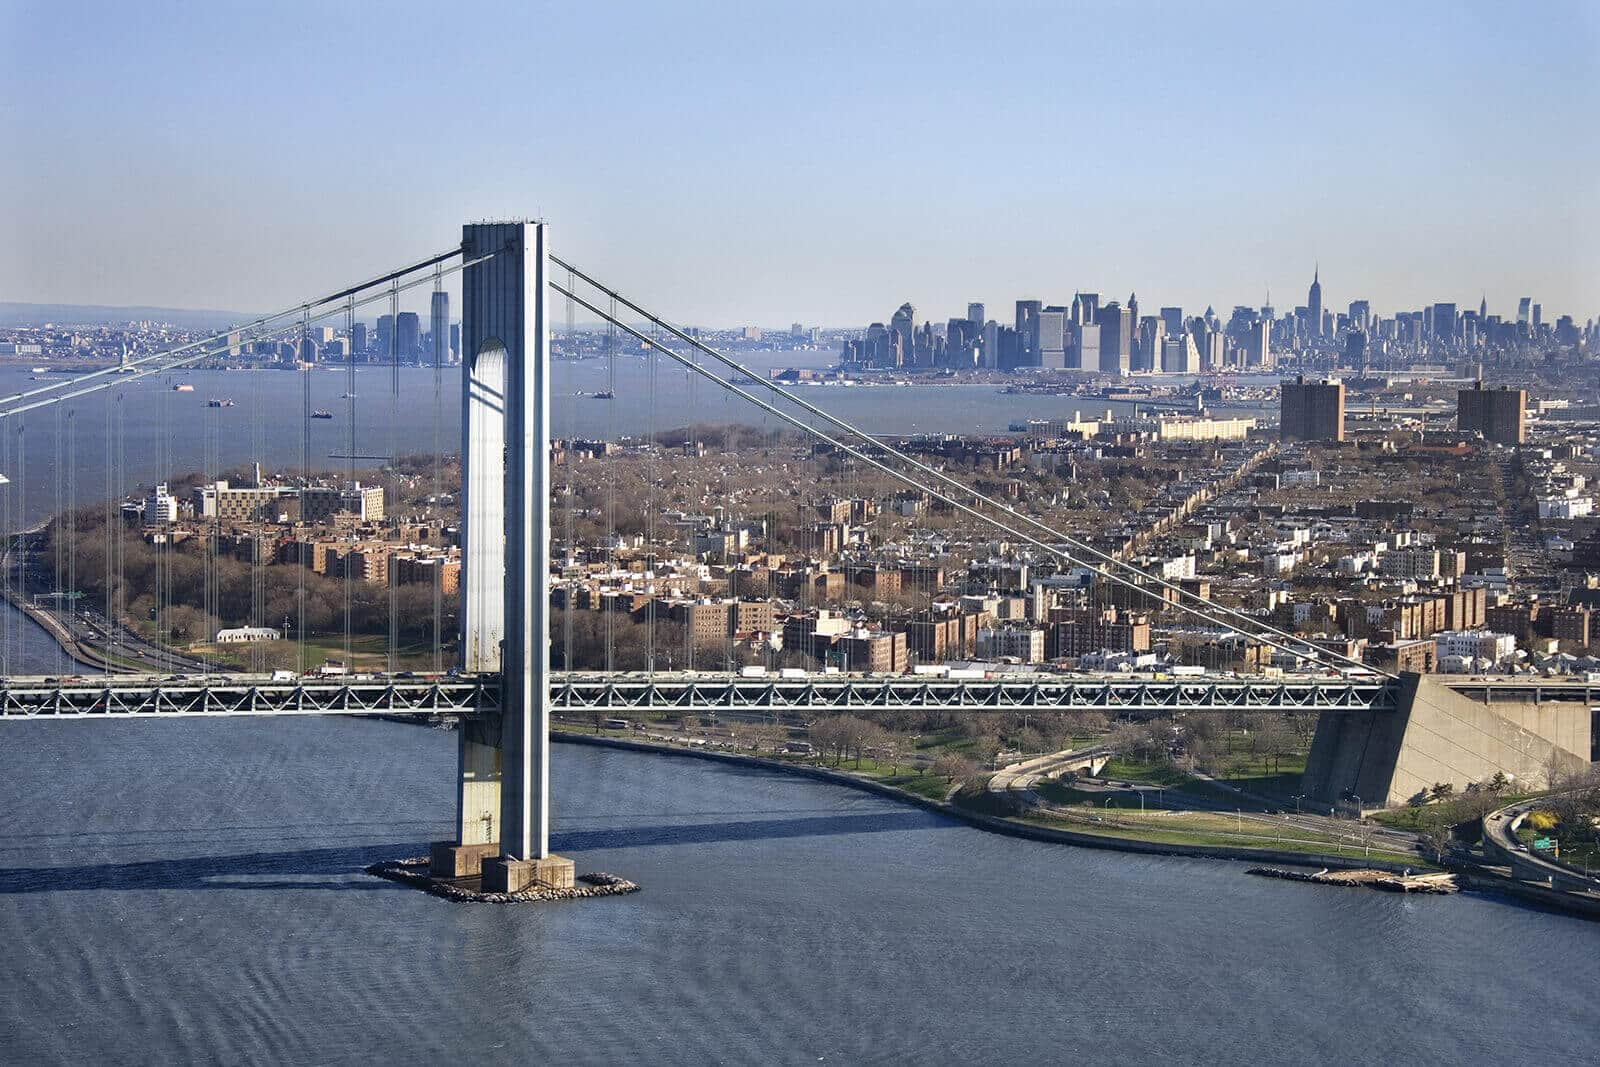 Verrazano Narrows Bridge, New York